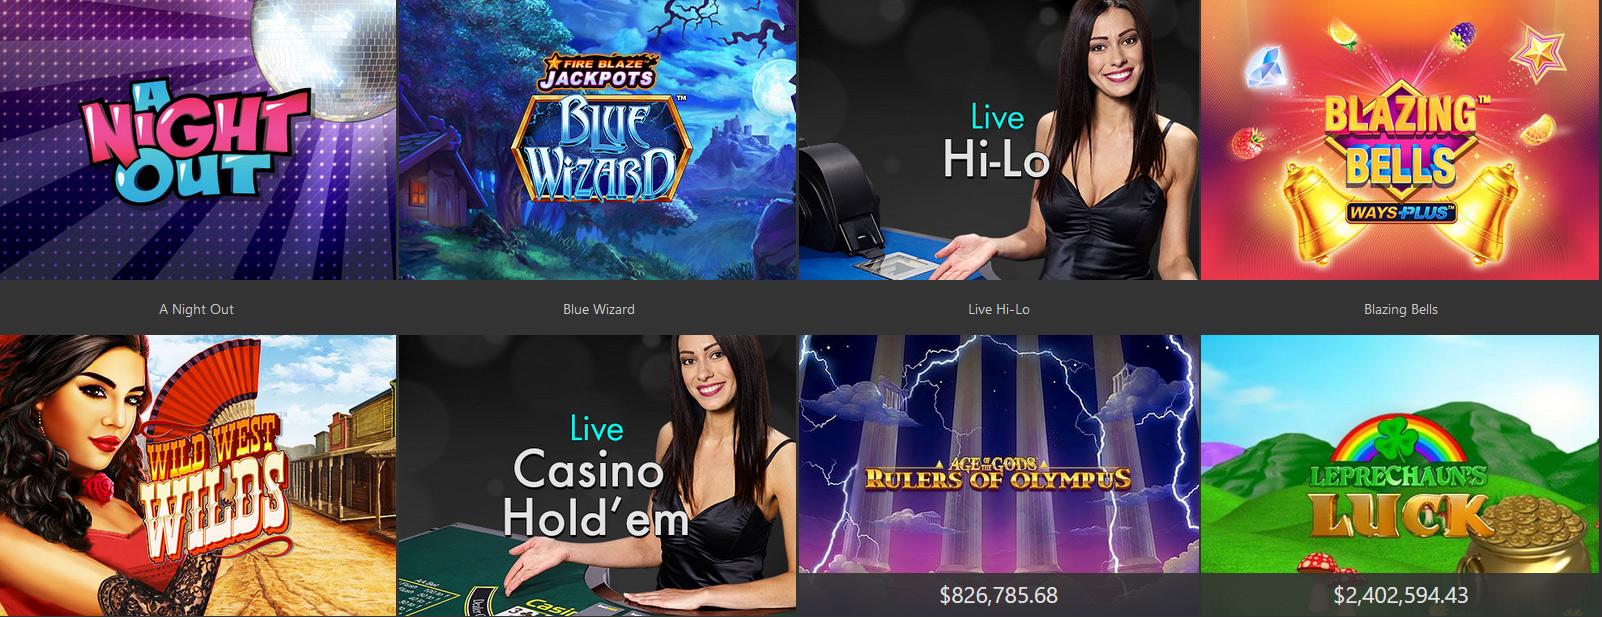 Bet365 Casino games.